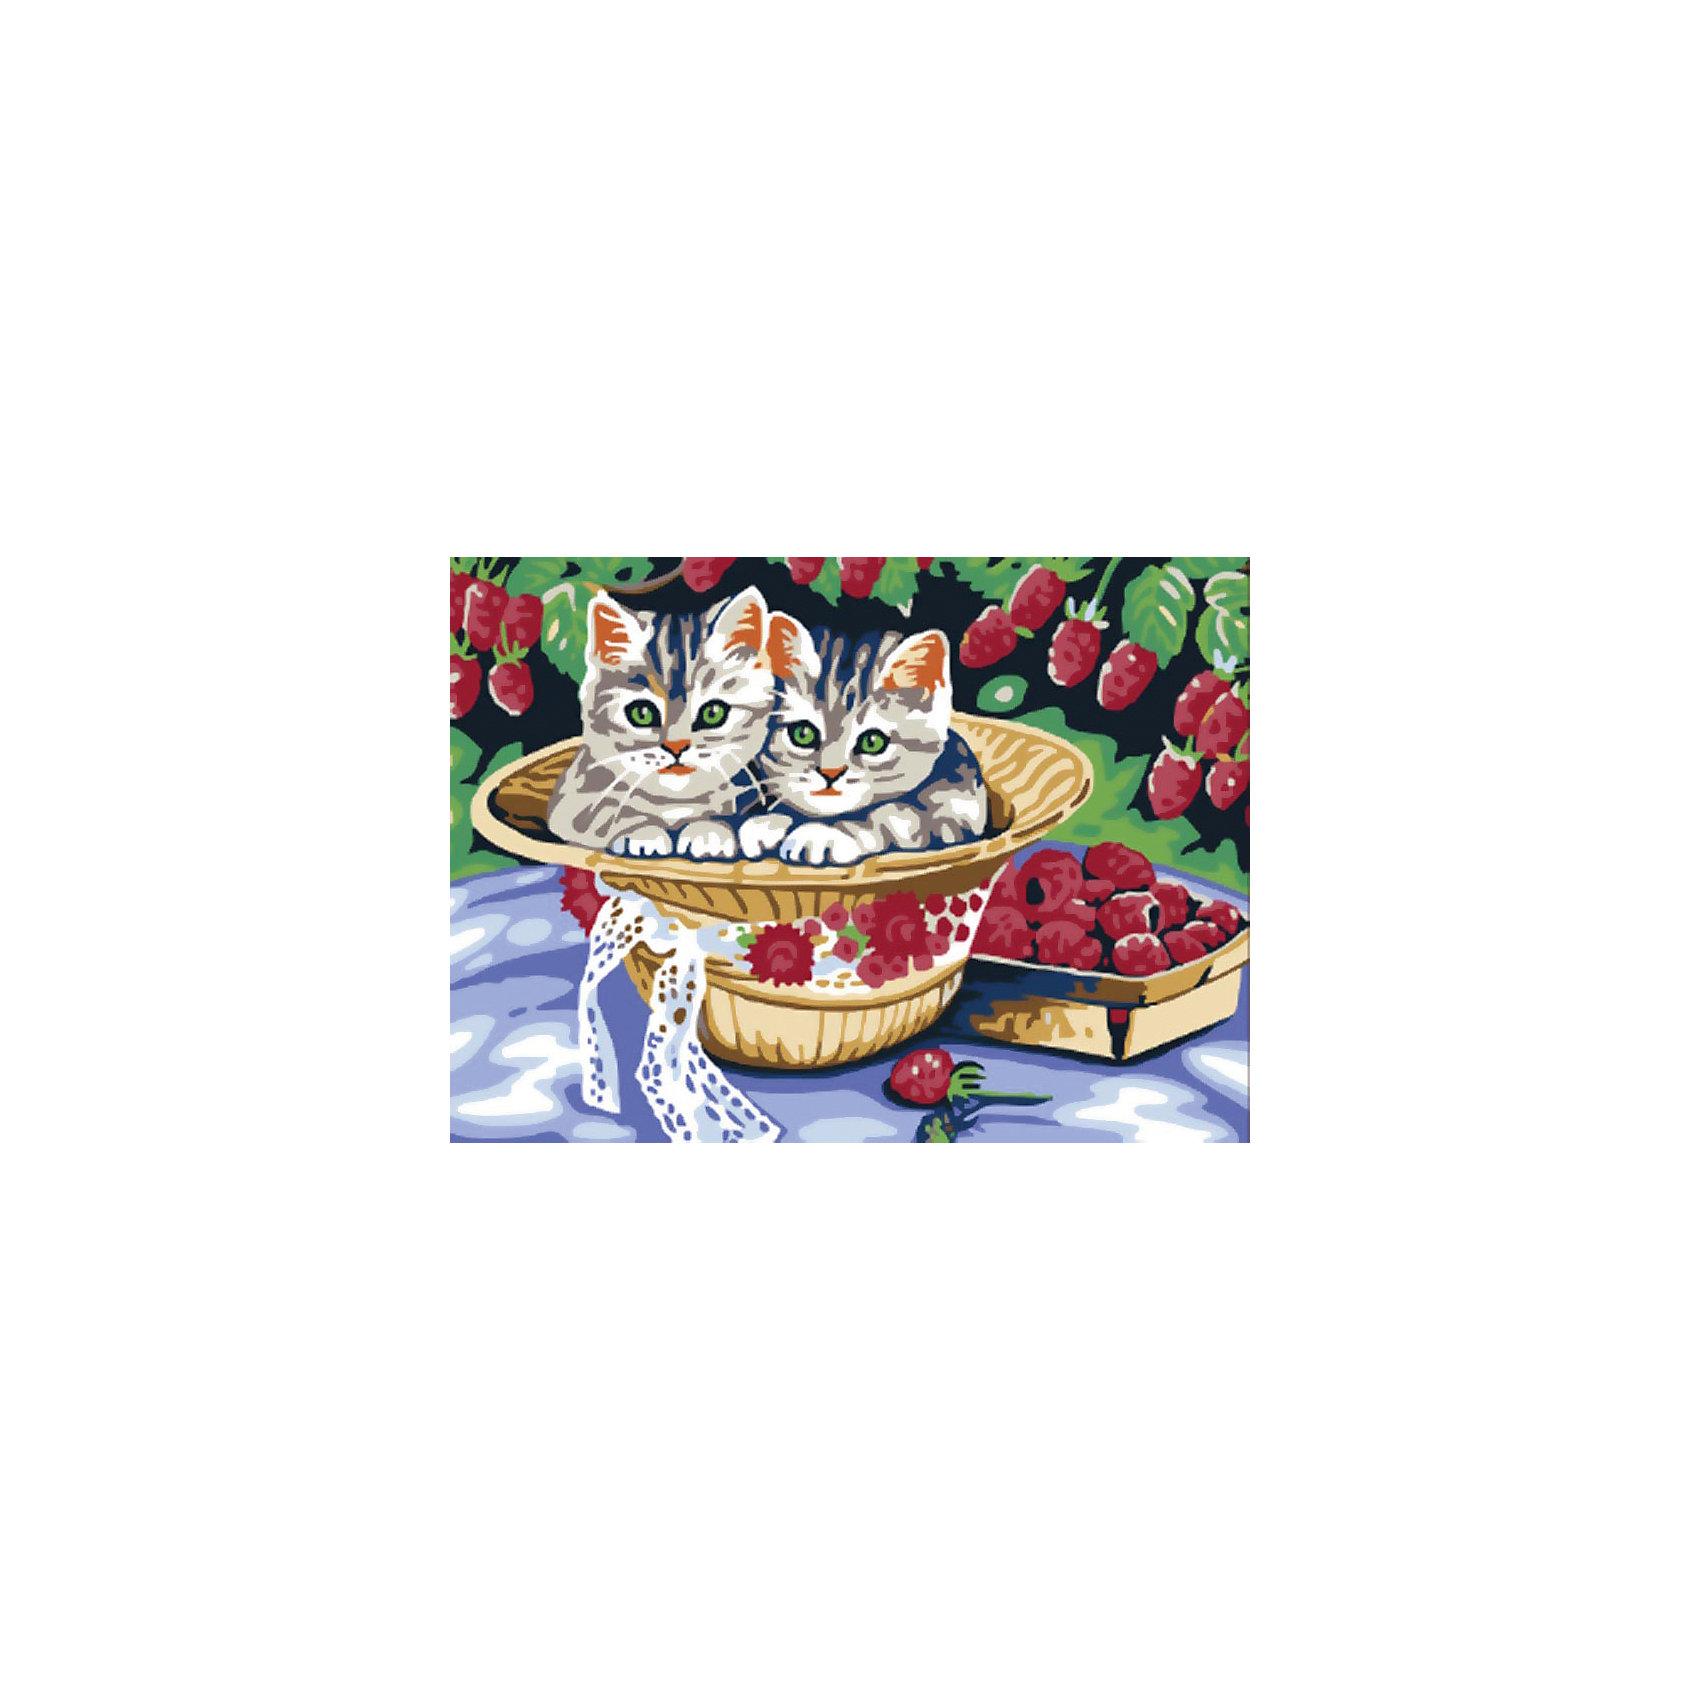 Белоснежка Живопись на холсте 30*40 см Котята в саду